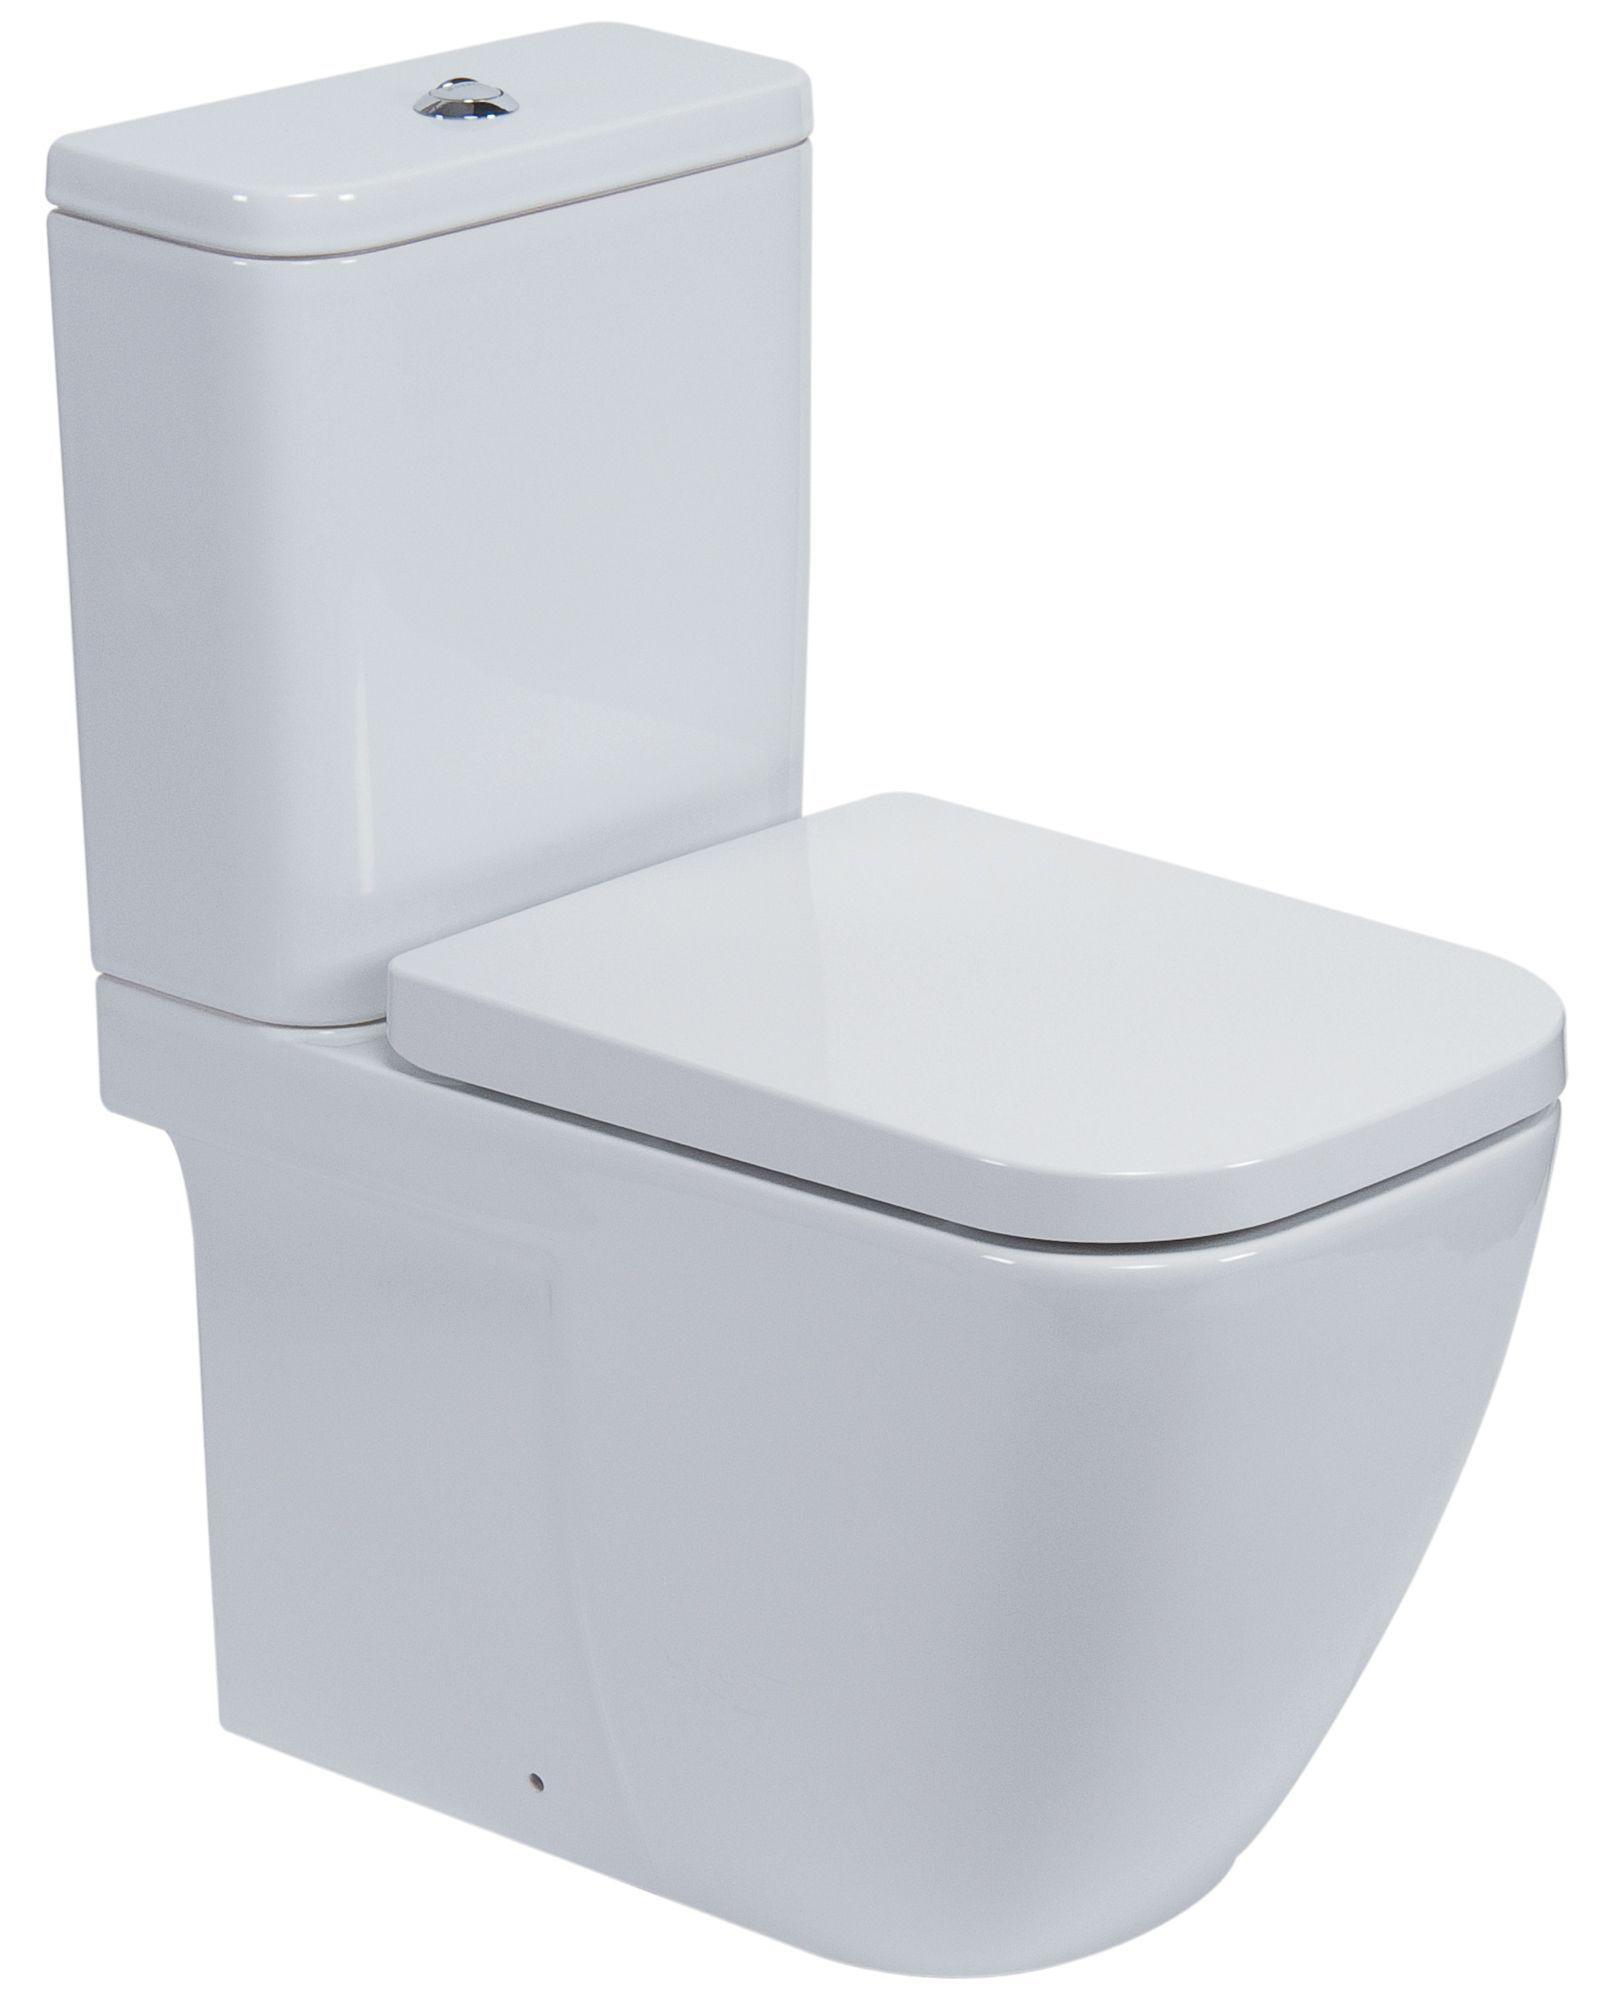 Tremendous Cooke Lewis Clancy Modern Close Coupled Toilet With Soft Machost Co Dining Chair Design Ideas Machostcouk